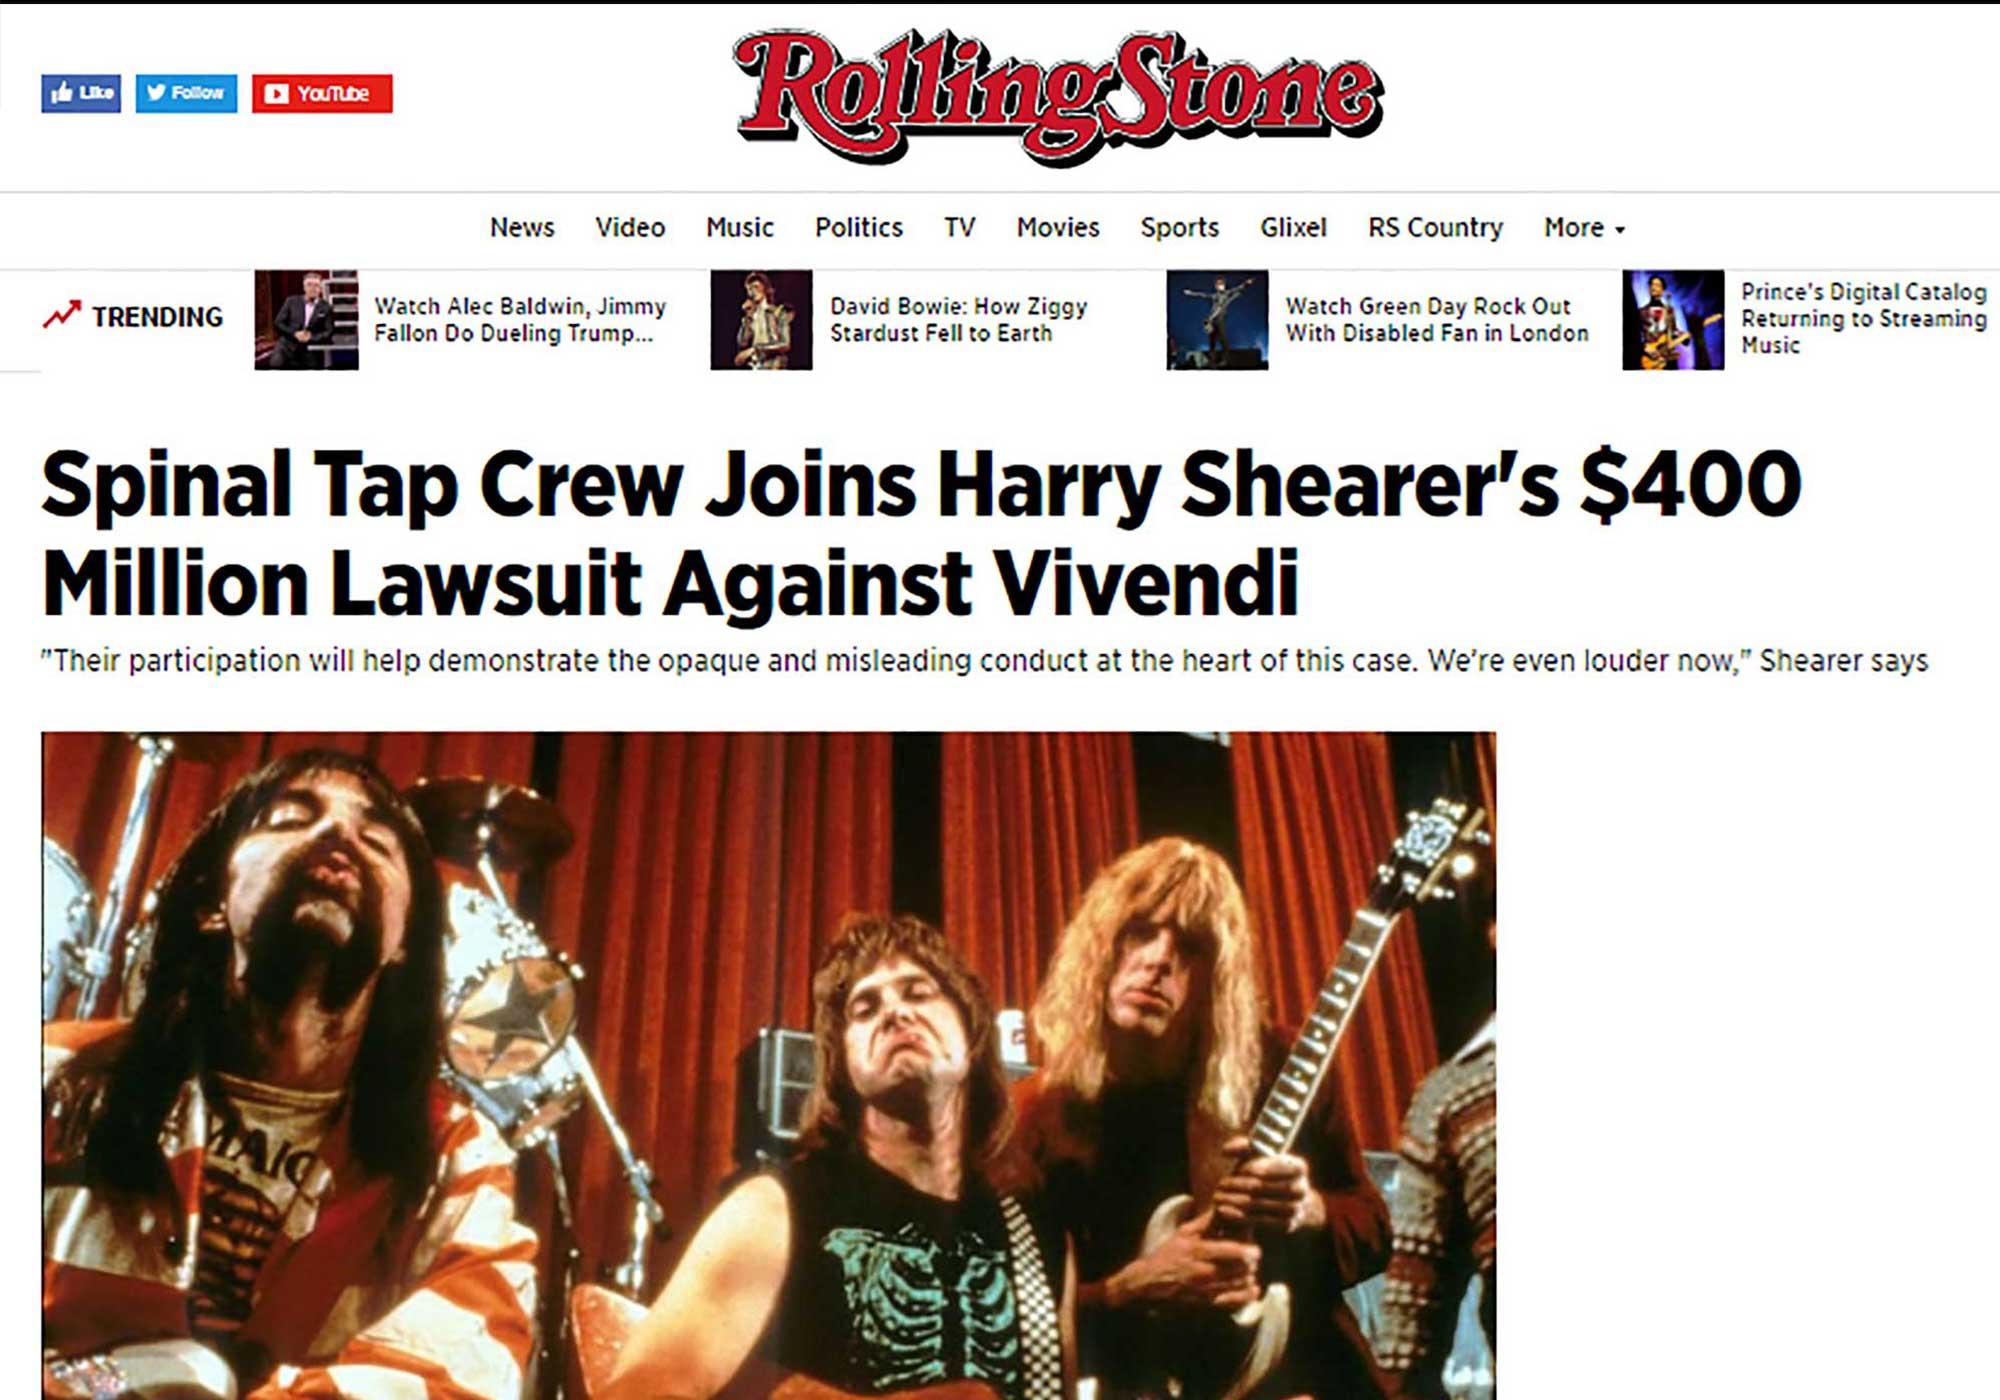 Fairness Rocks News Spinal Tap Crew Joins Harry Shearer's $400 Million Lawsuit Against Vivendi